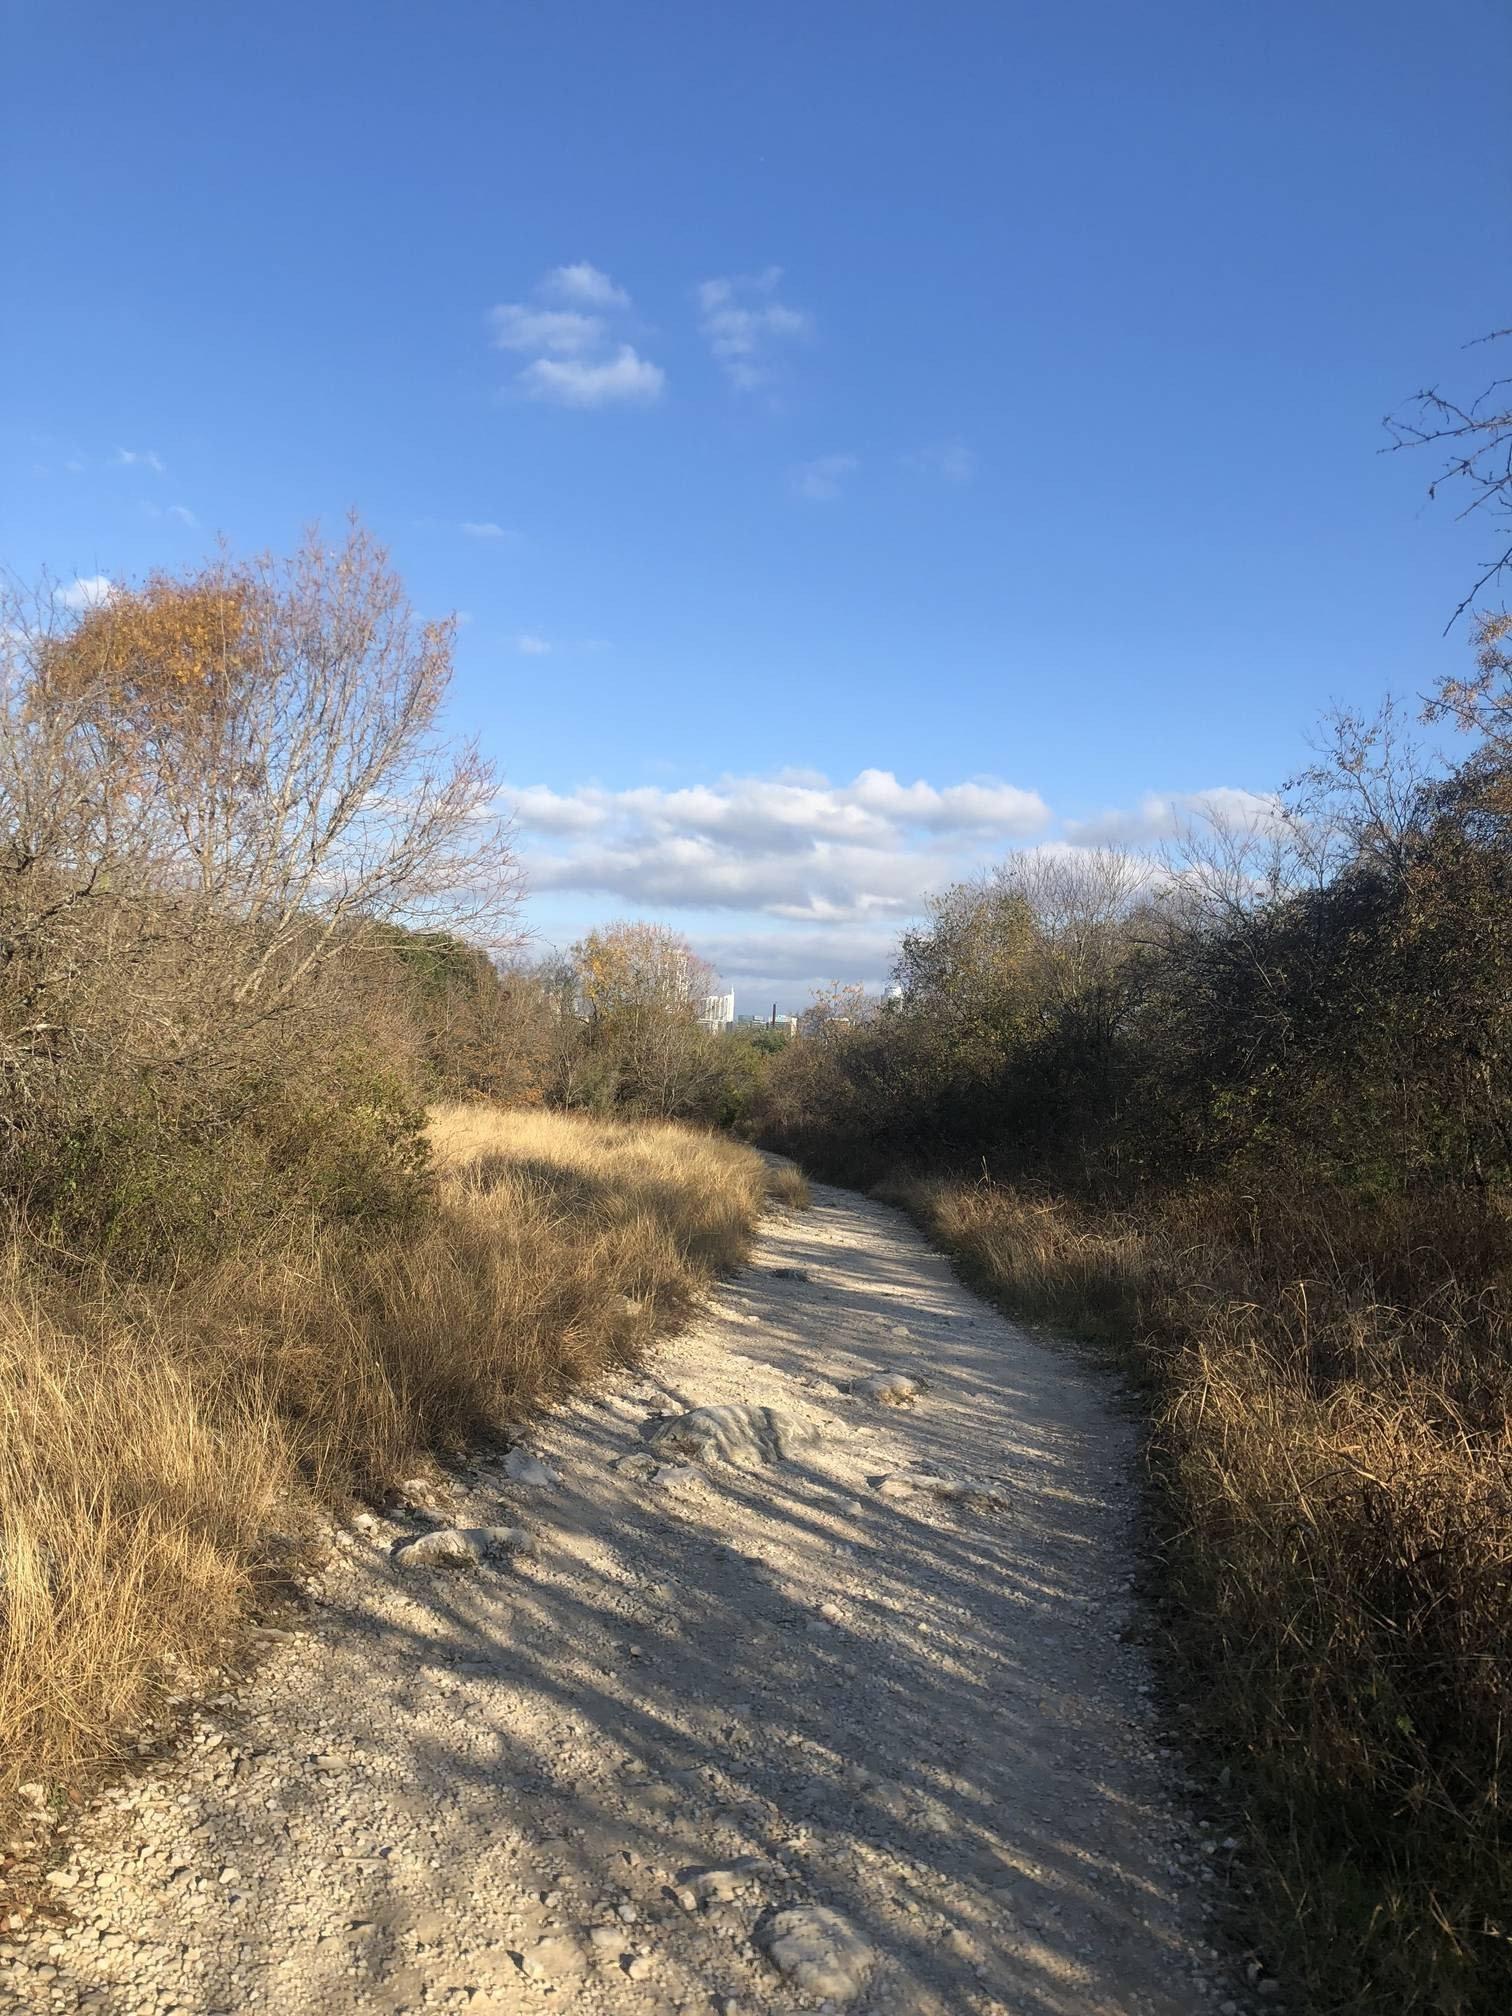 Image of the Barton Creek Trail.